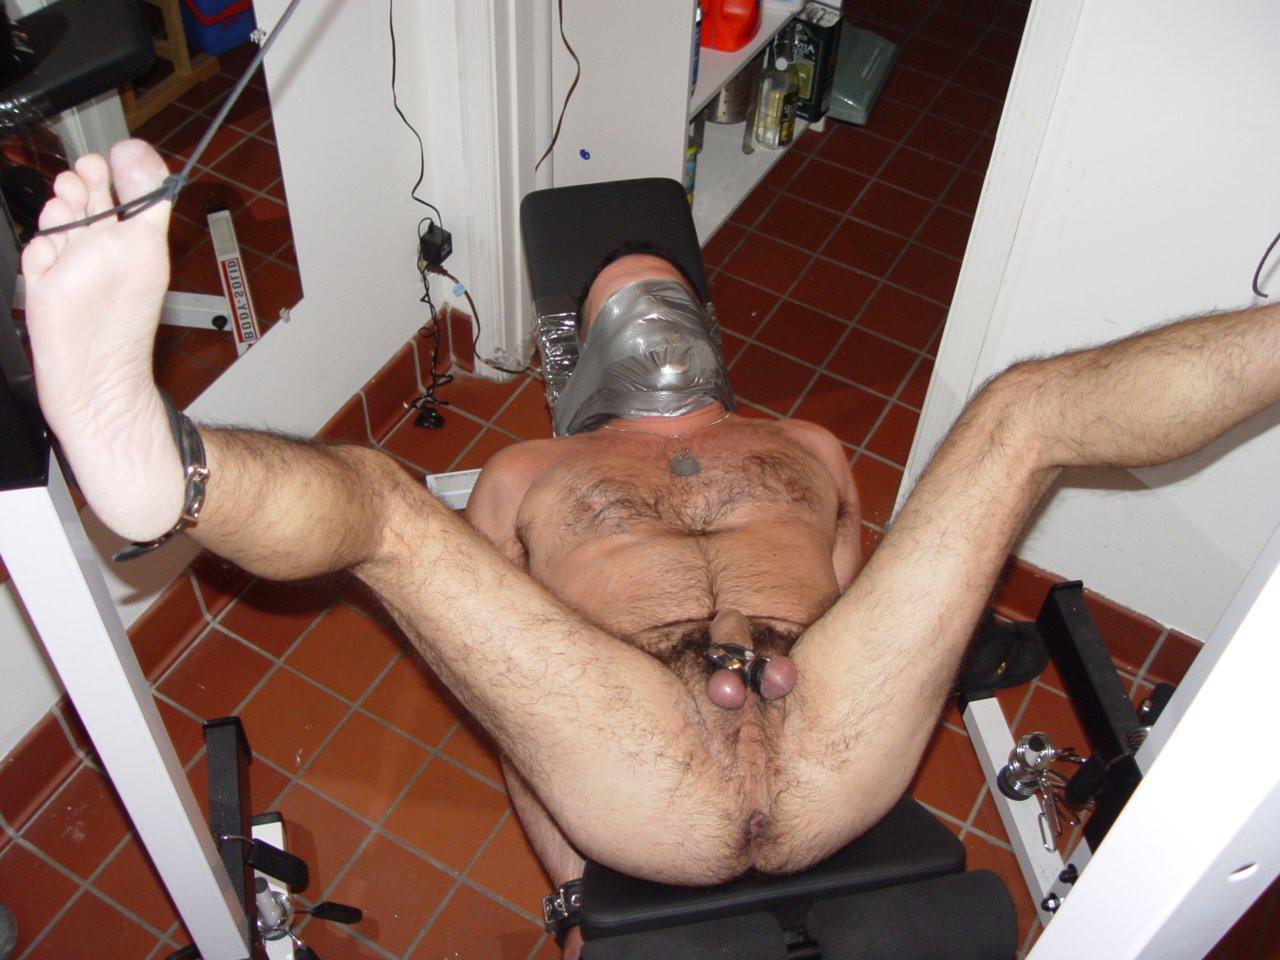 MetalbondNYC duct tape 08